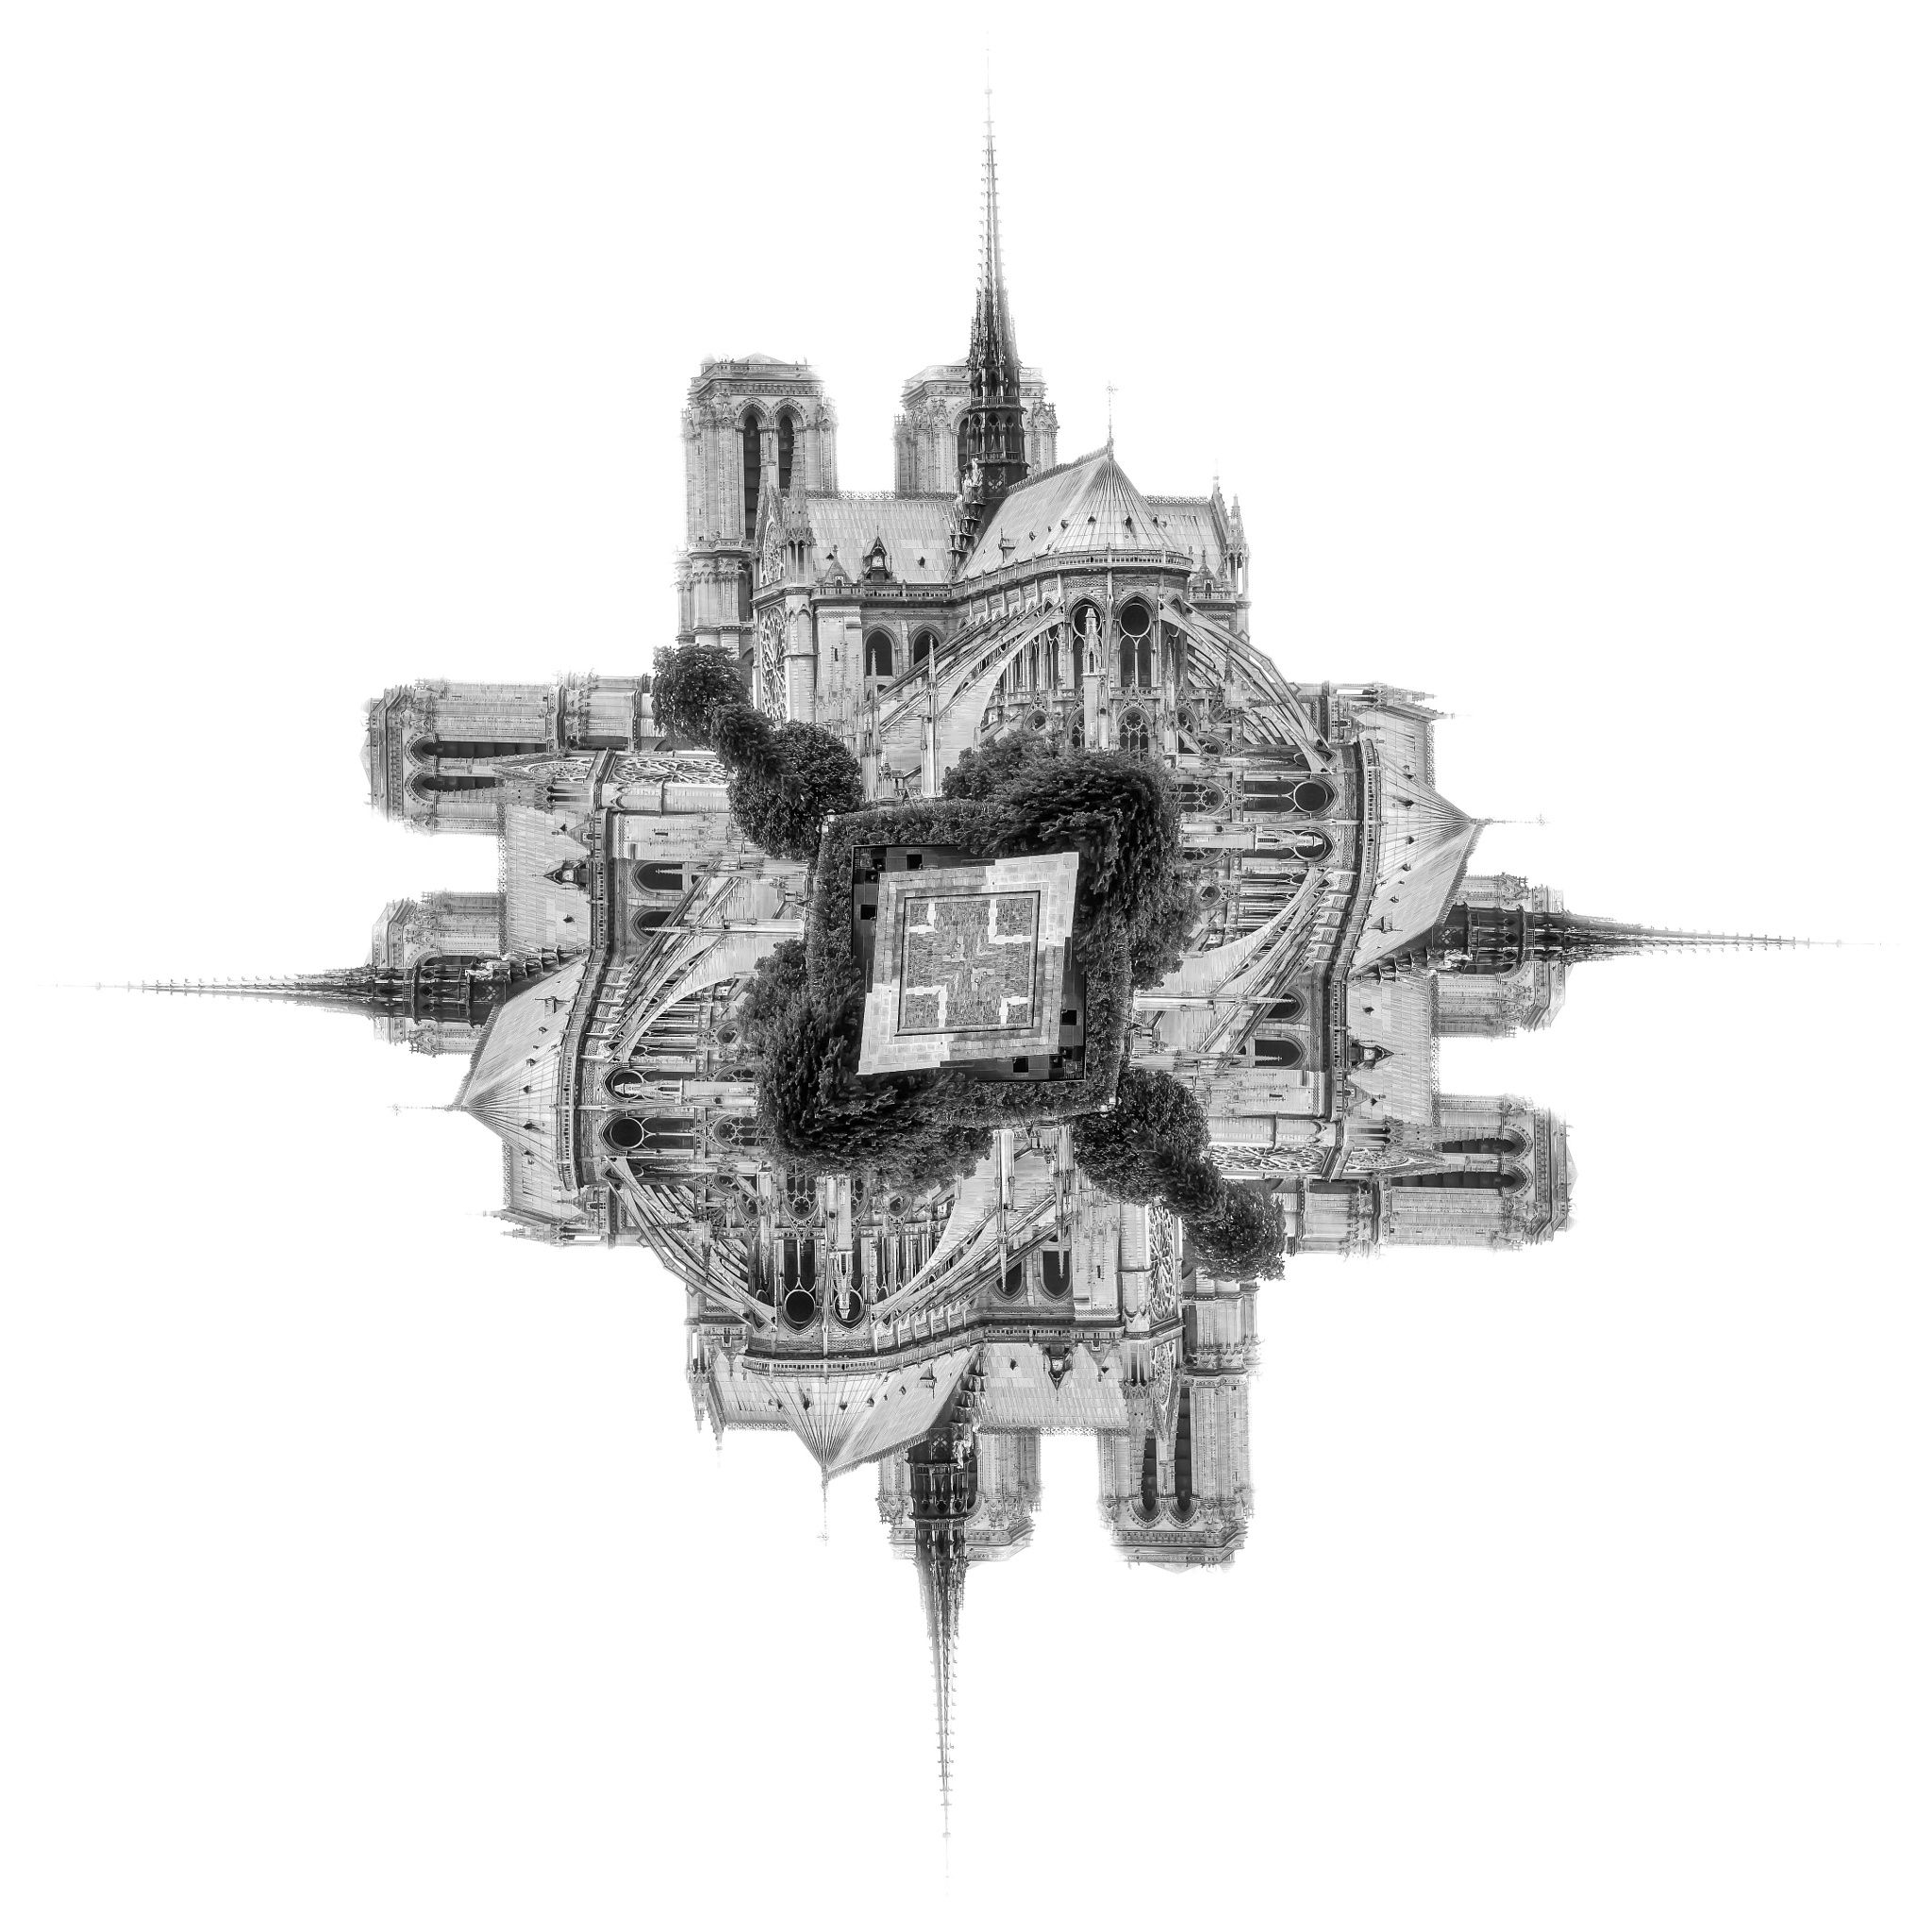 Notre-dame de Paris - Each monument consists on its own architectural identity of a city...